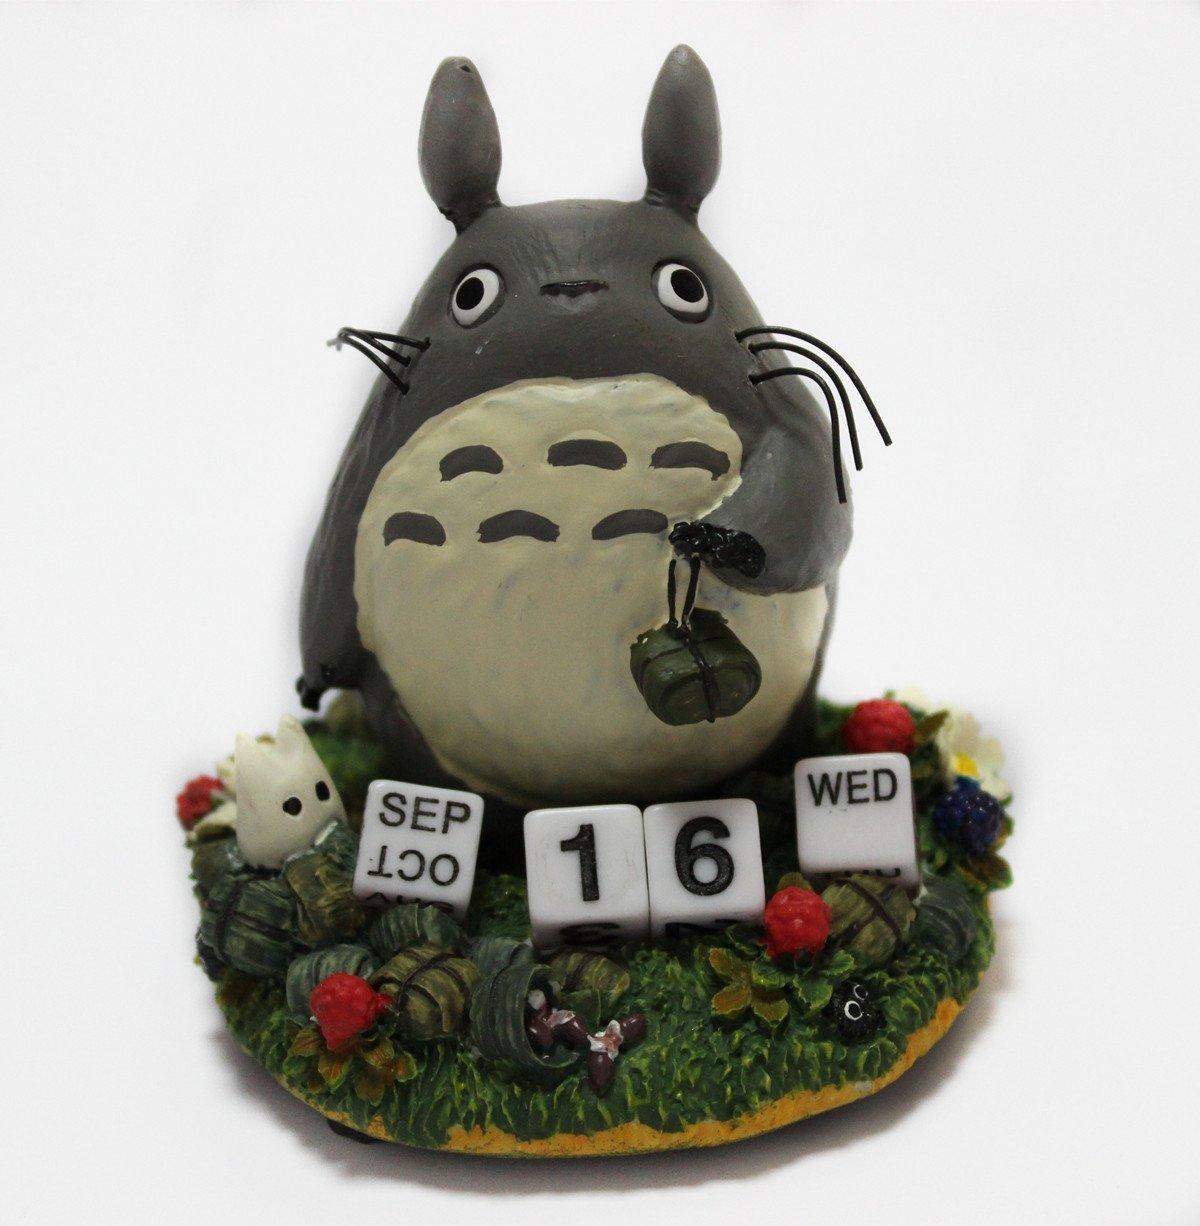 venta al por mayor barato JapanCos Studio Ghibli My Neighbor Totoro Calendar Calendar Calendar miniature figurine Anime Cartoon Gift  directo de fábrica